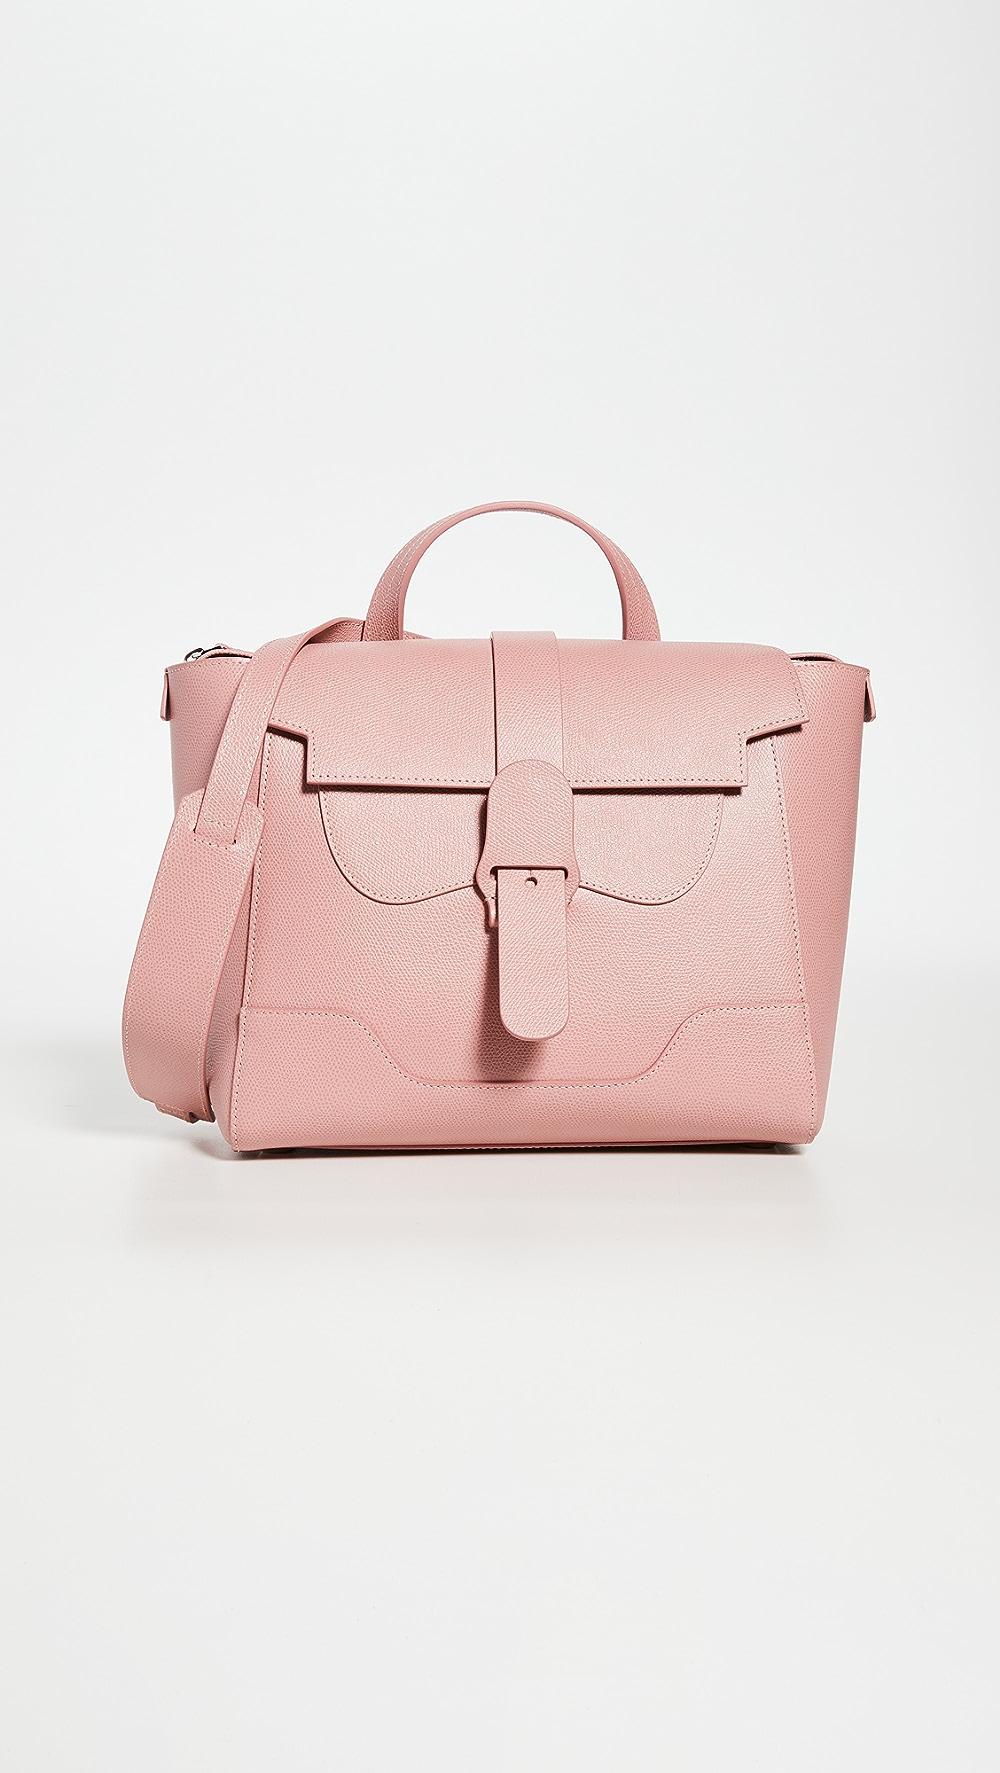 Cooperative Senreve - The Midi Maestra Bag Bright Luster